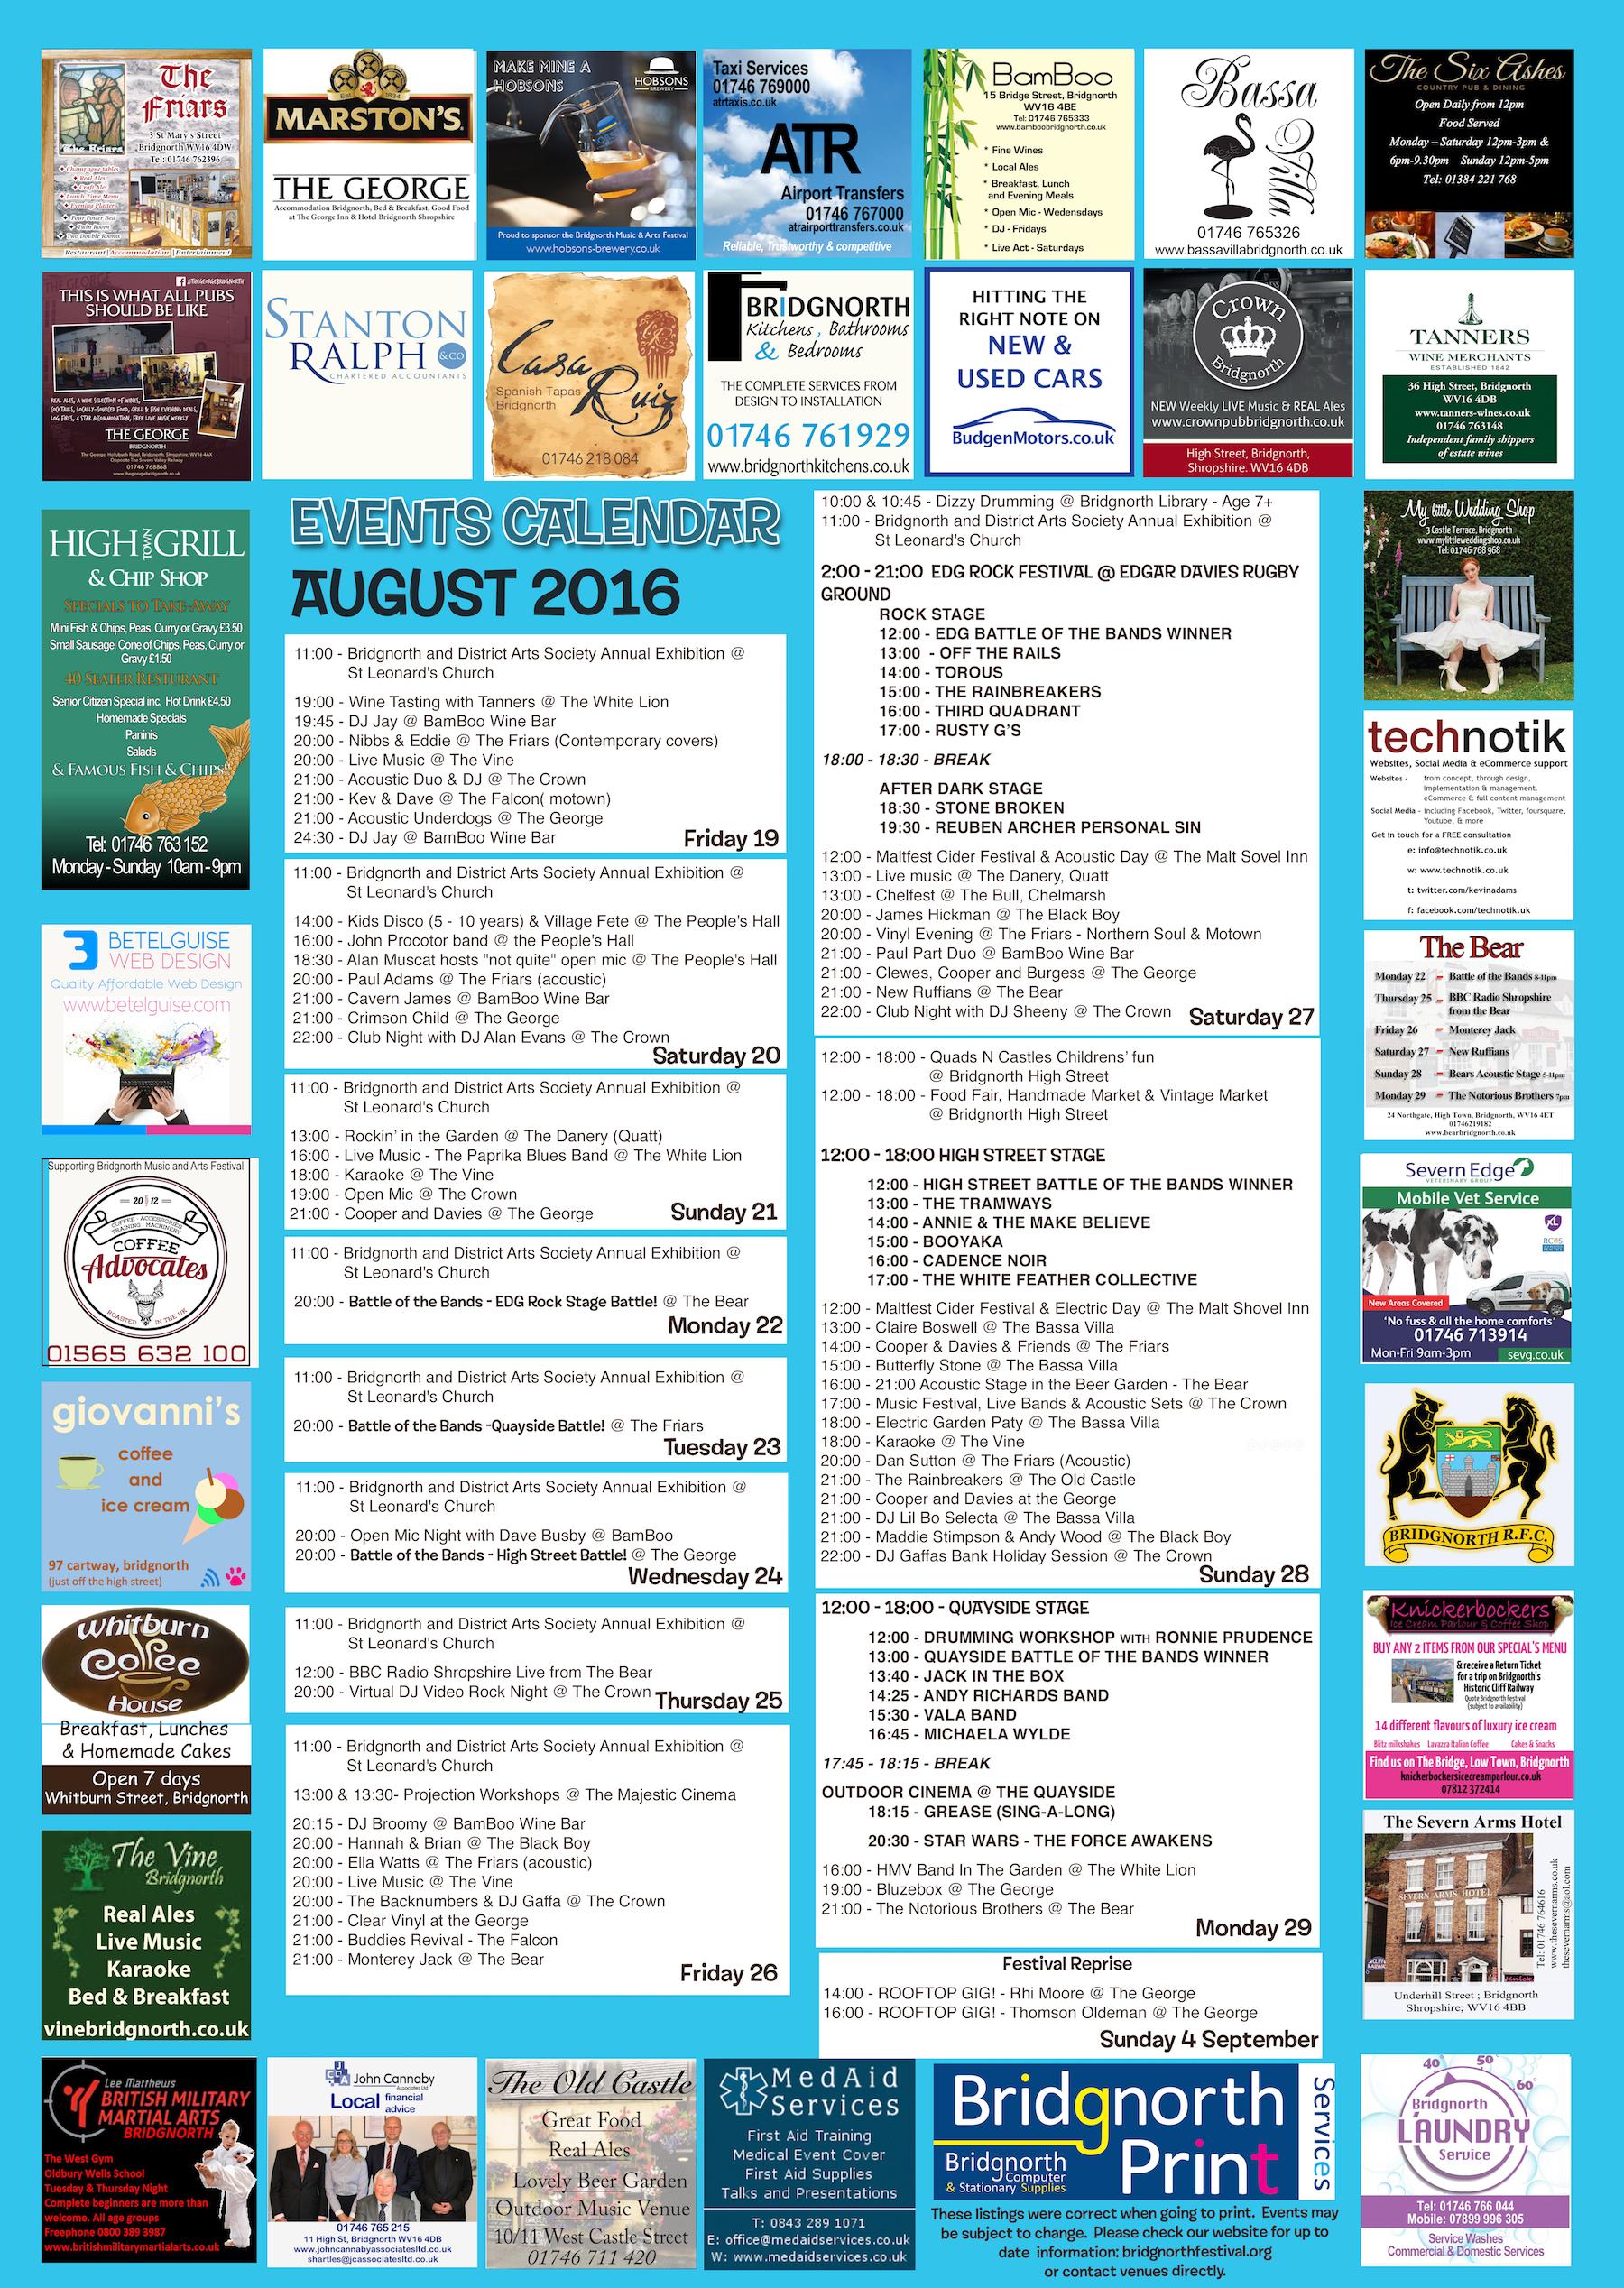 Festival Calendar for 2016 | Bridgnorth Music and Arts Festival